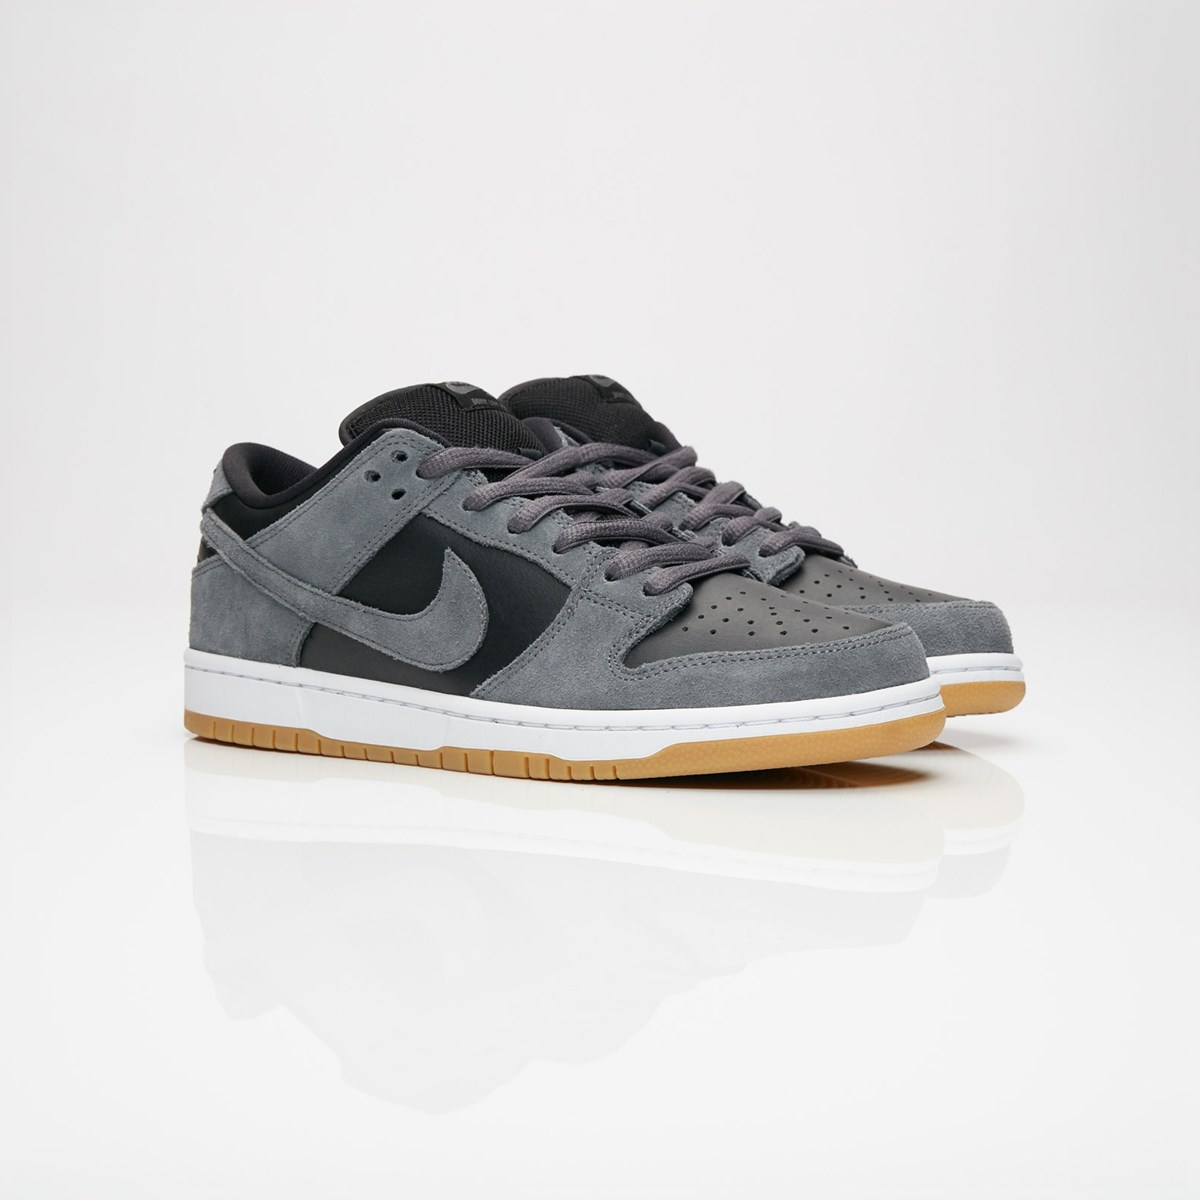 nike dunk low trd ar0778 001 sneakers   streetwear på nätet sen 1999.  SNEAKERSNSTUFF 17c76771aa91